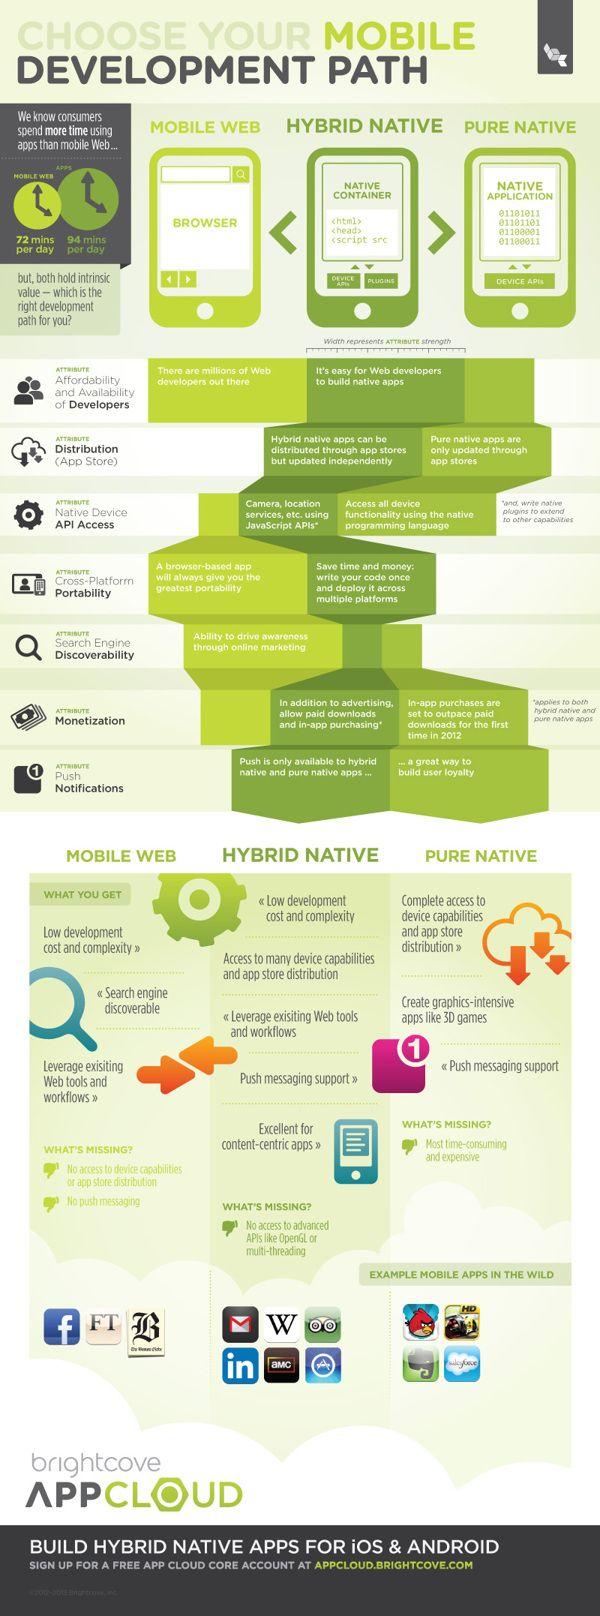 Infographic: Choose Your Mobile Development Path by Kristine MacAulay, via Behance